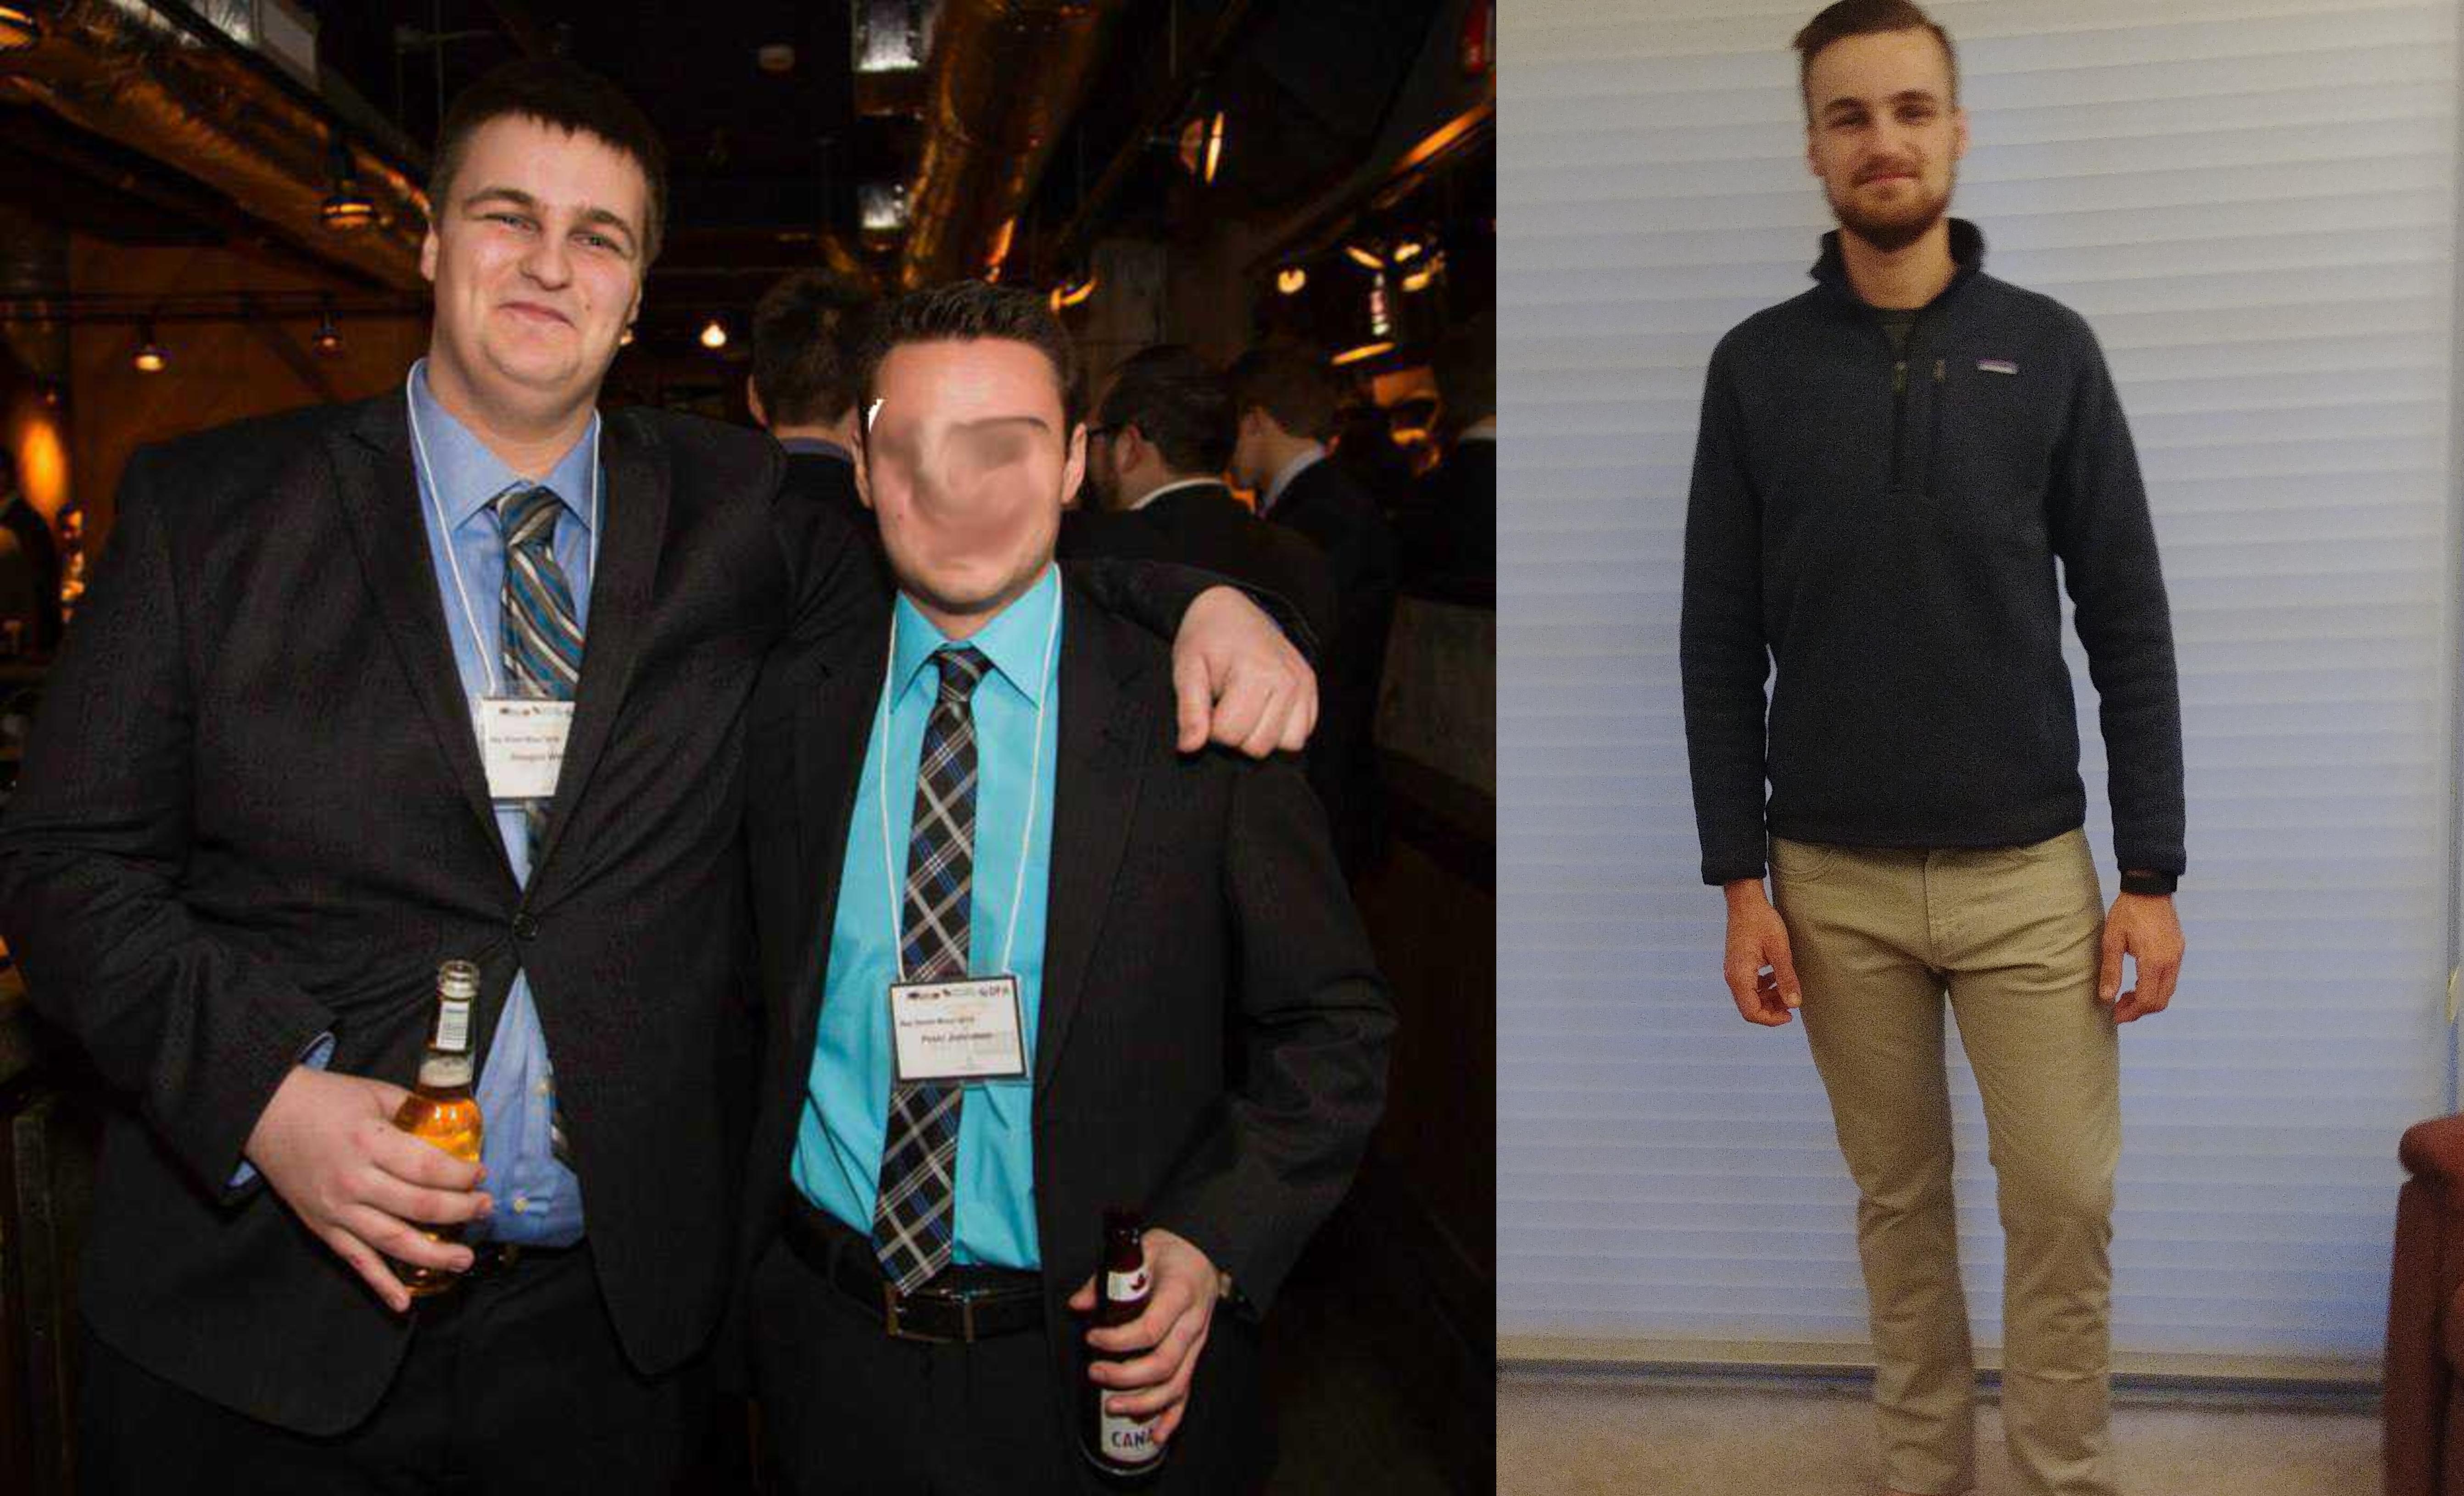 6'2 Male Progress Pics of 159 lbs Weight Loss 340 lbs to 181 lbs